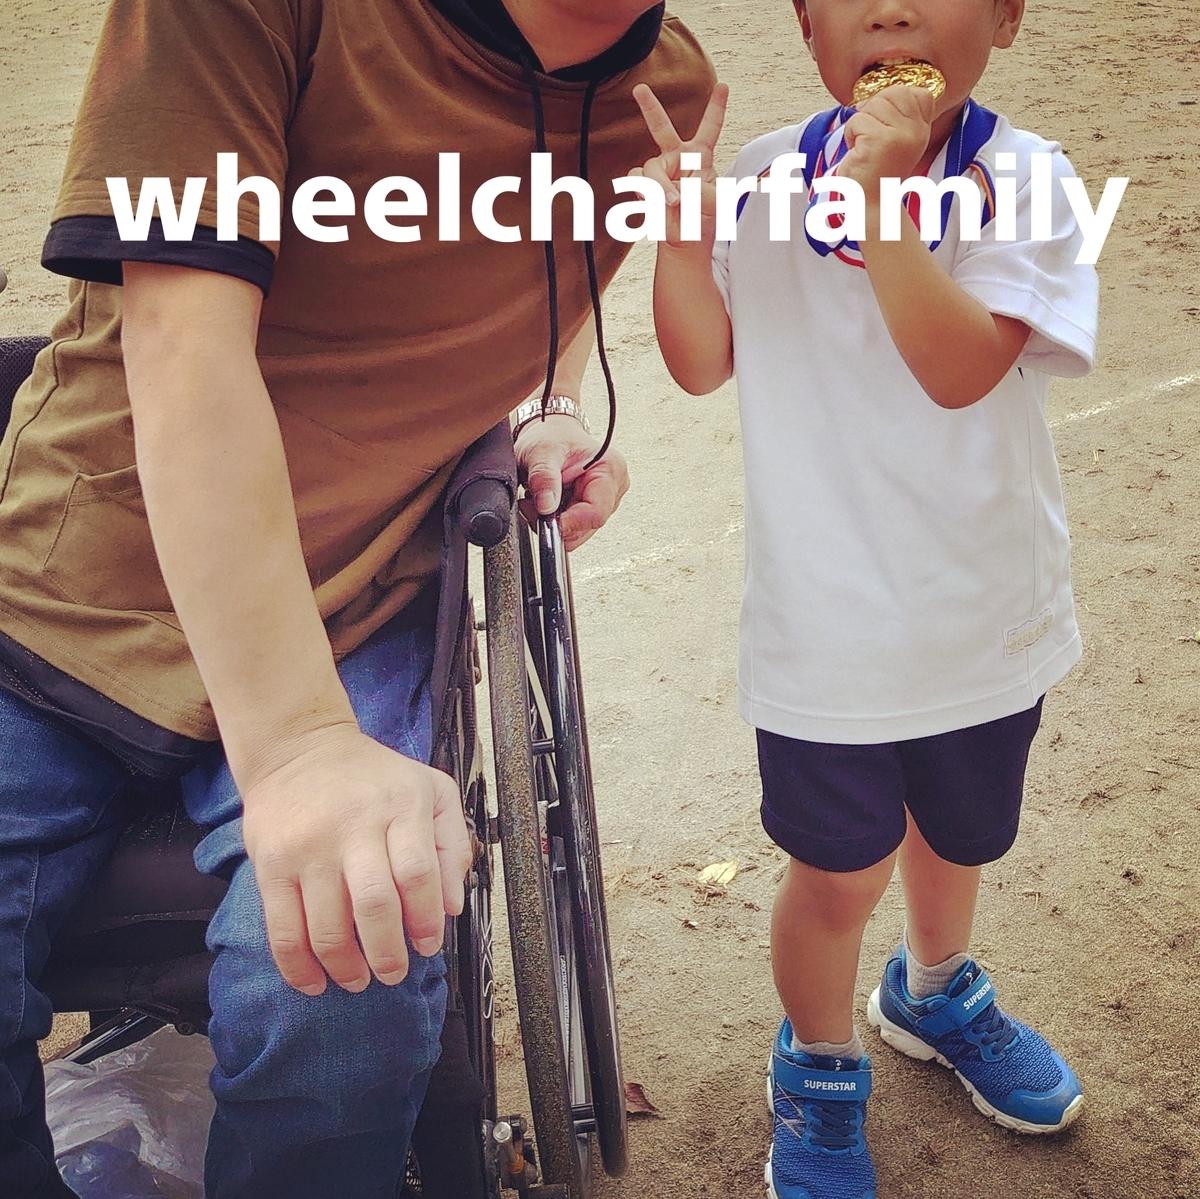 f:id:WheelchairFamily:20191009110053j:plain